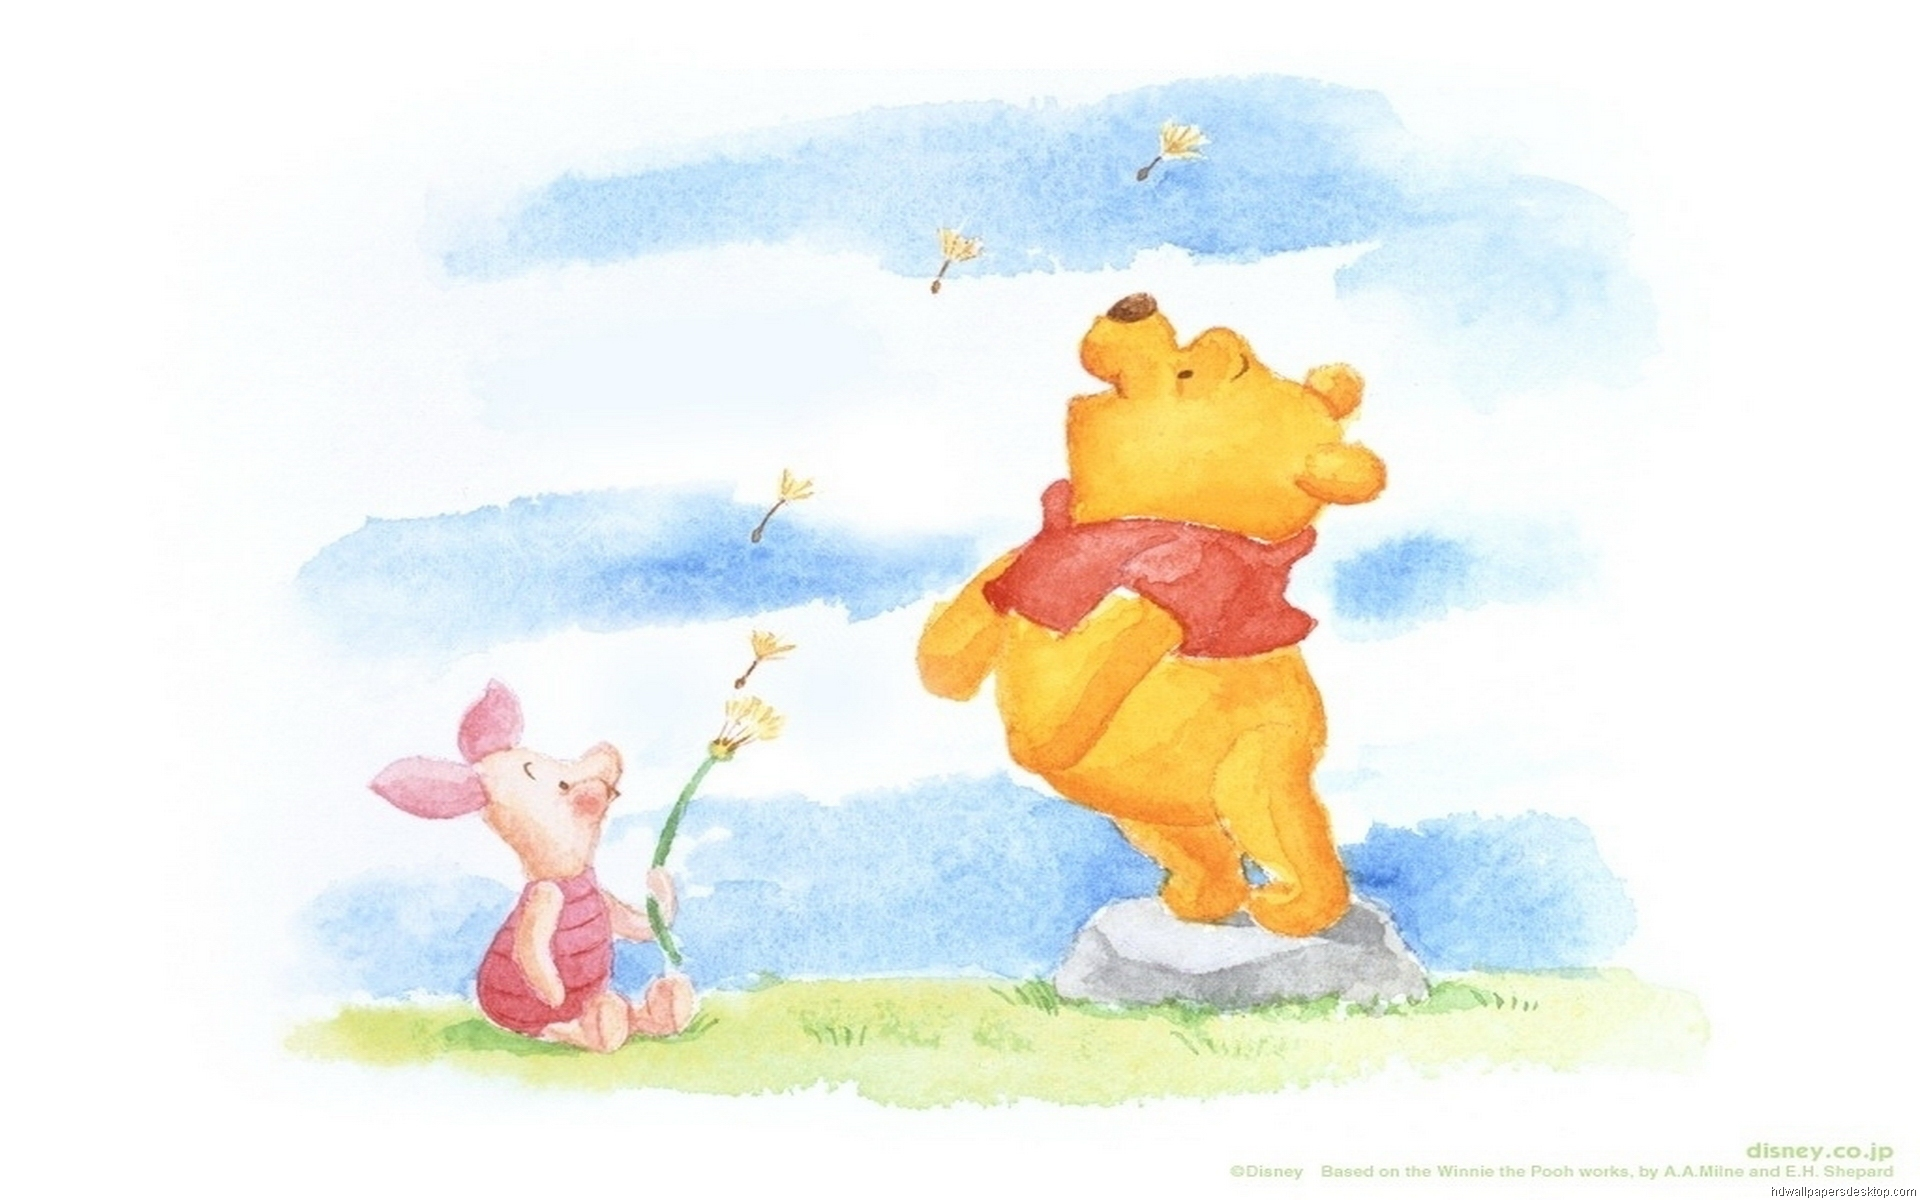 Disney Wallpapers Hd Desktop Winnie The Pooh Wallpaper 1920x1200